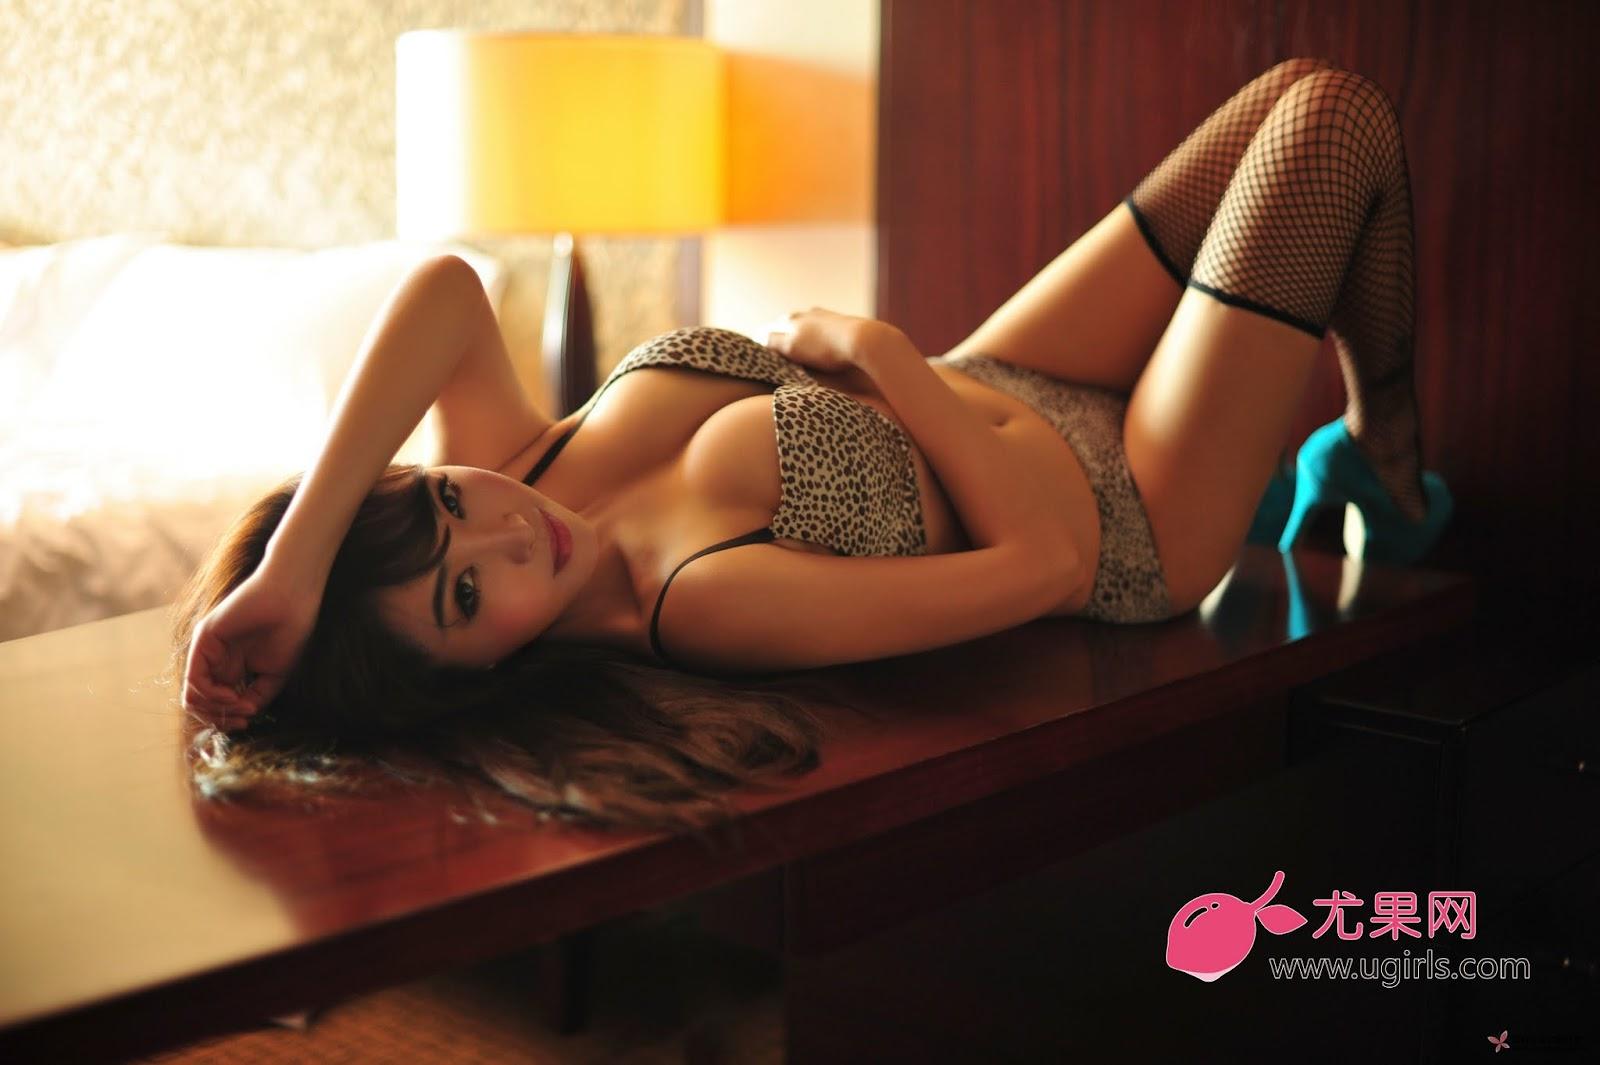 DLS 4680 - Hot Girl Model UGIRLS NO.13